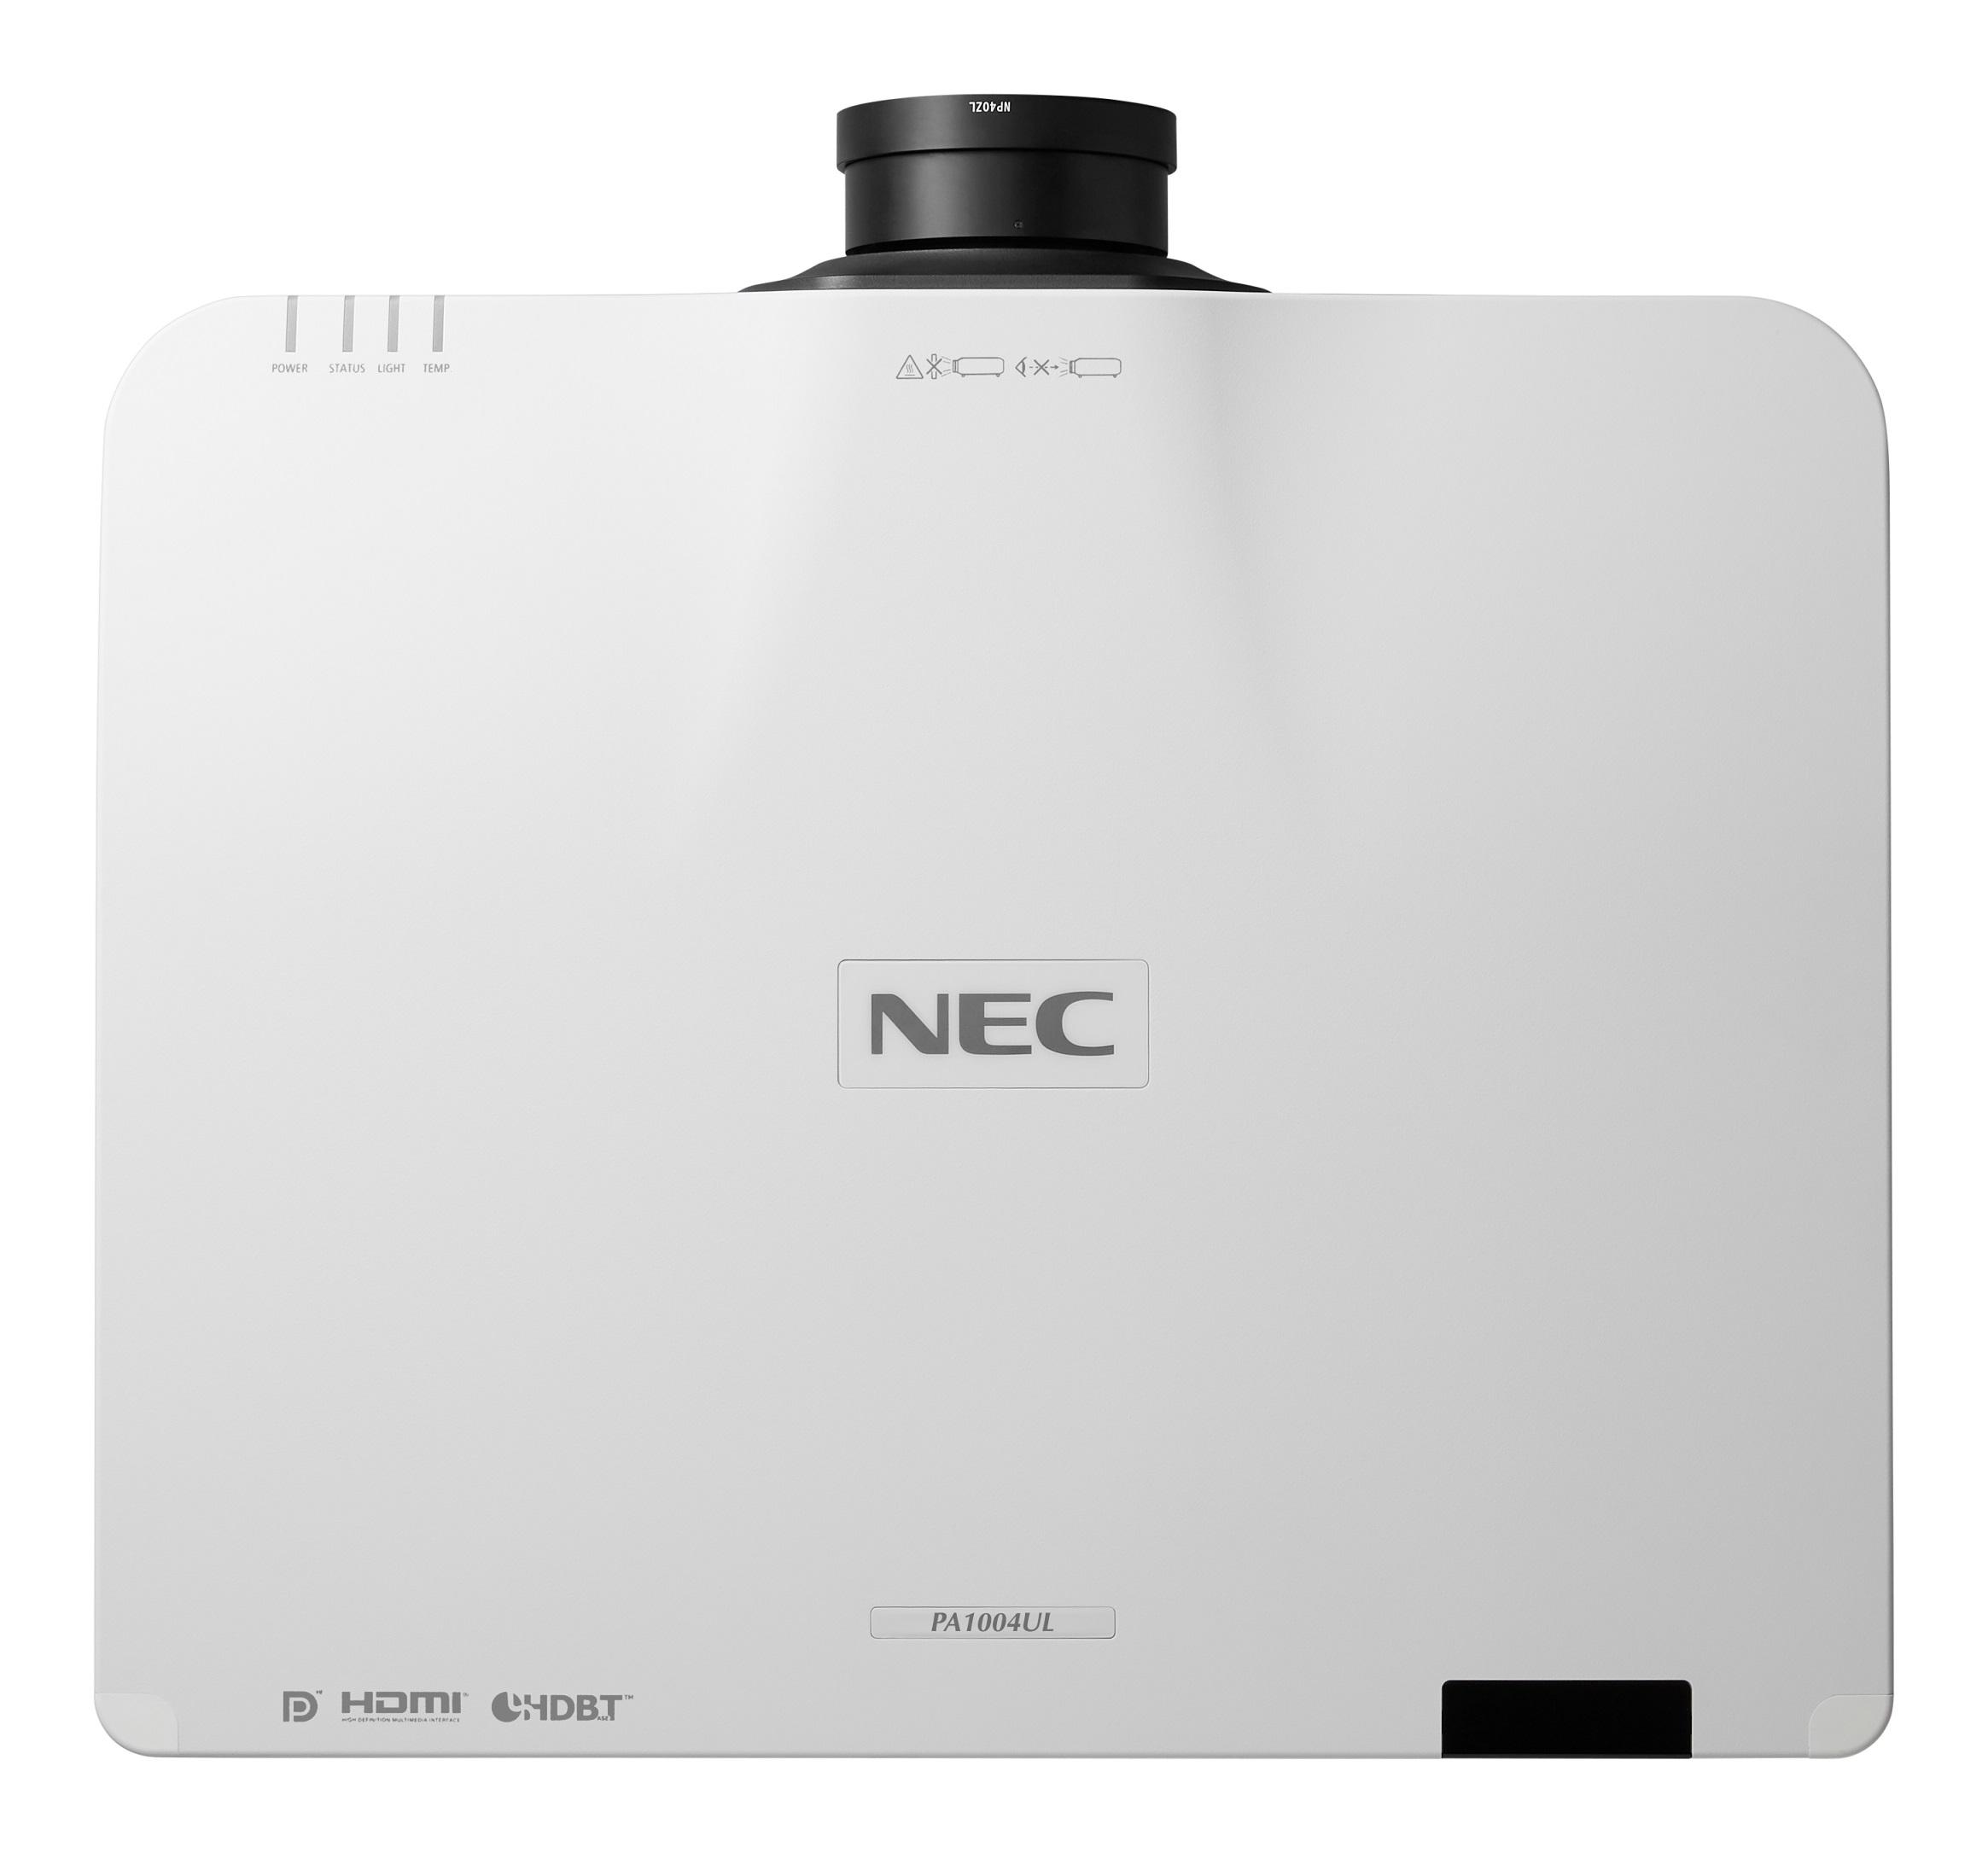 NEC Welcomes New Class Of Quiet Laser Projectors